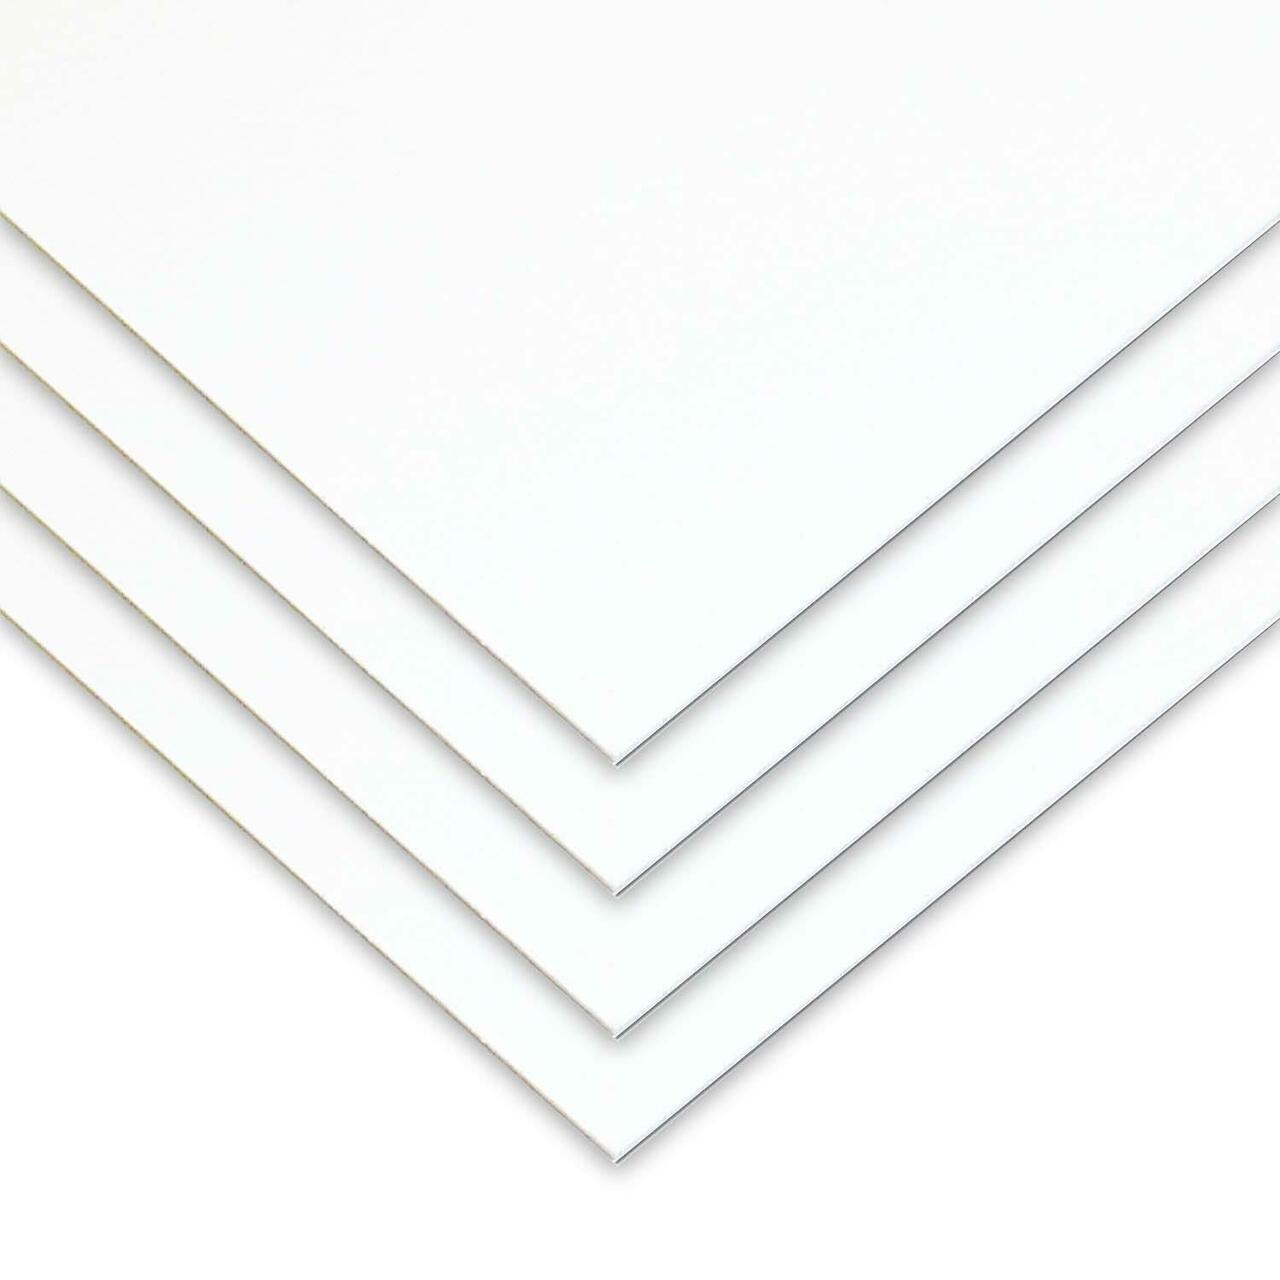 Chapa poliestireno branco 1mmX1000mmX2000mm